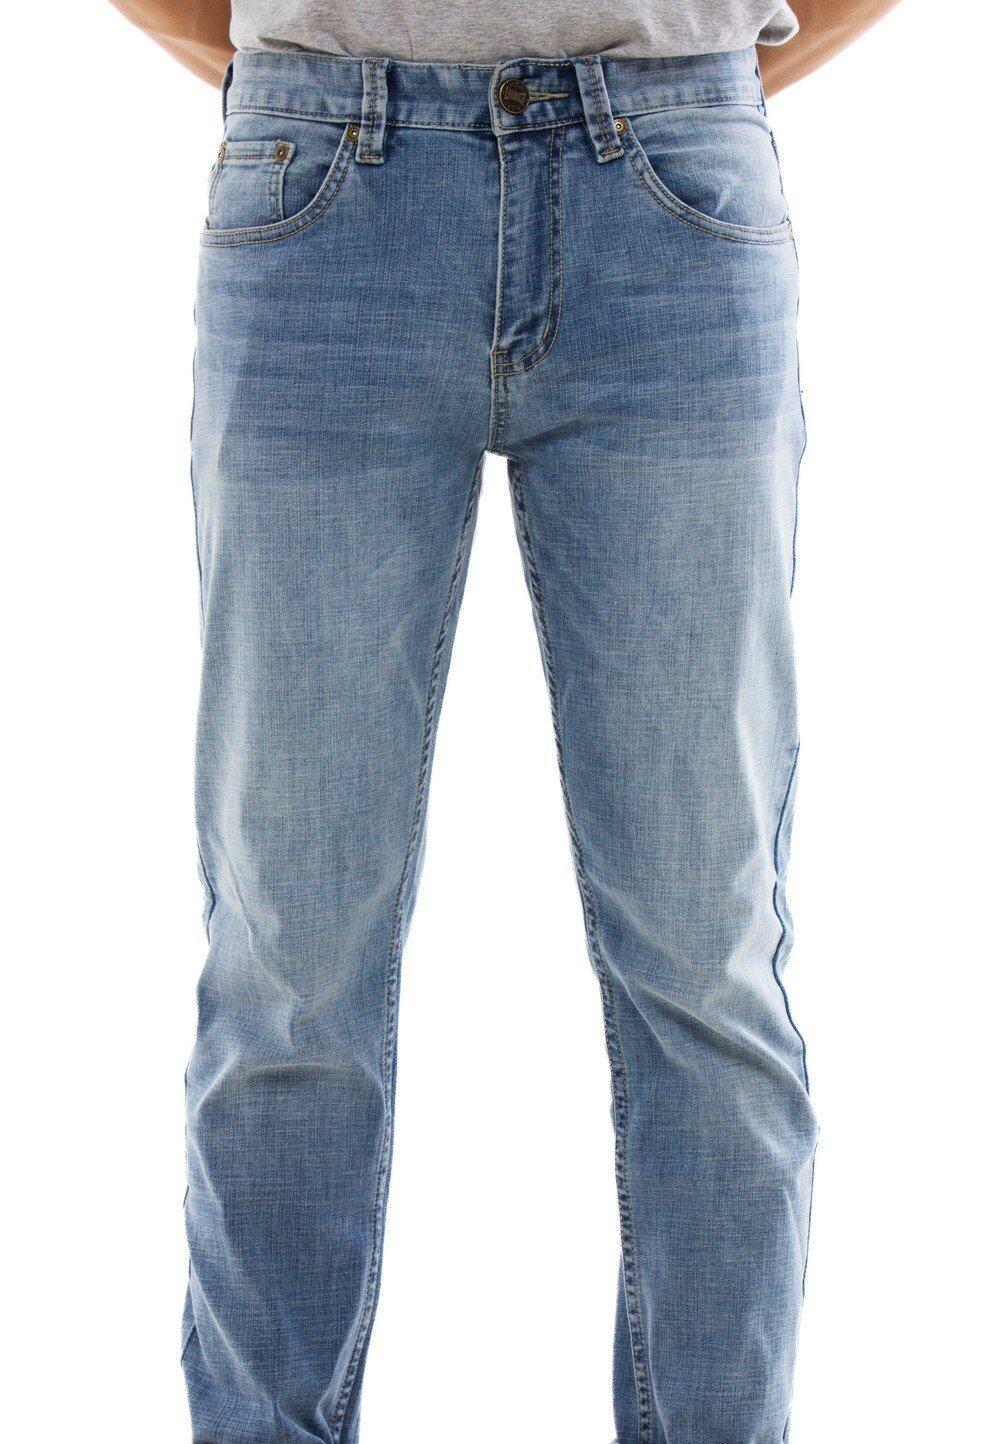 Stretchable Slim Fit Denim Long Pants 778